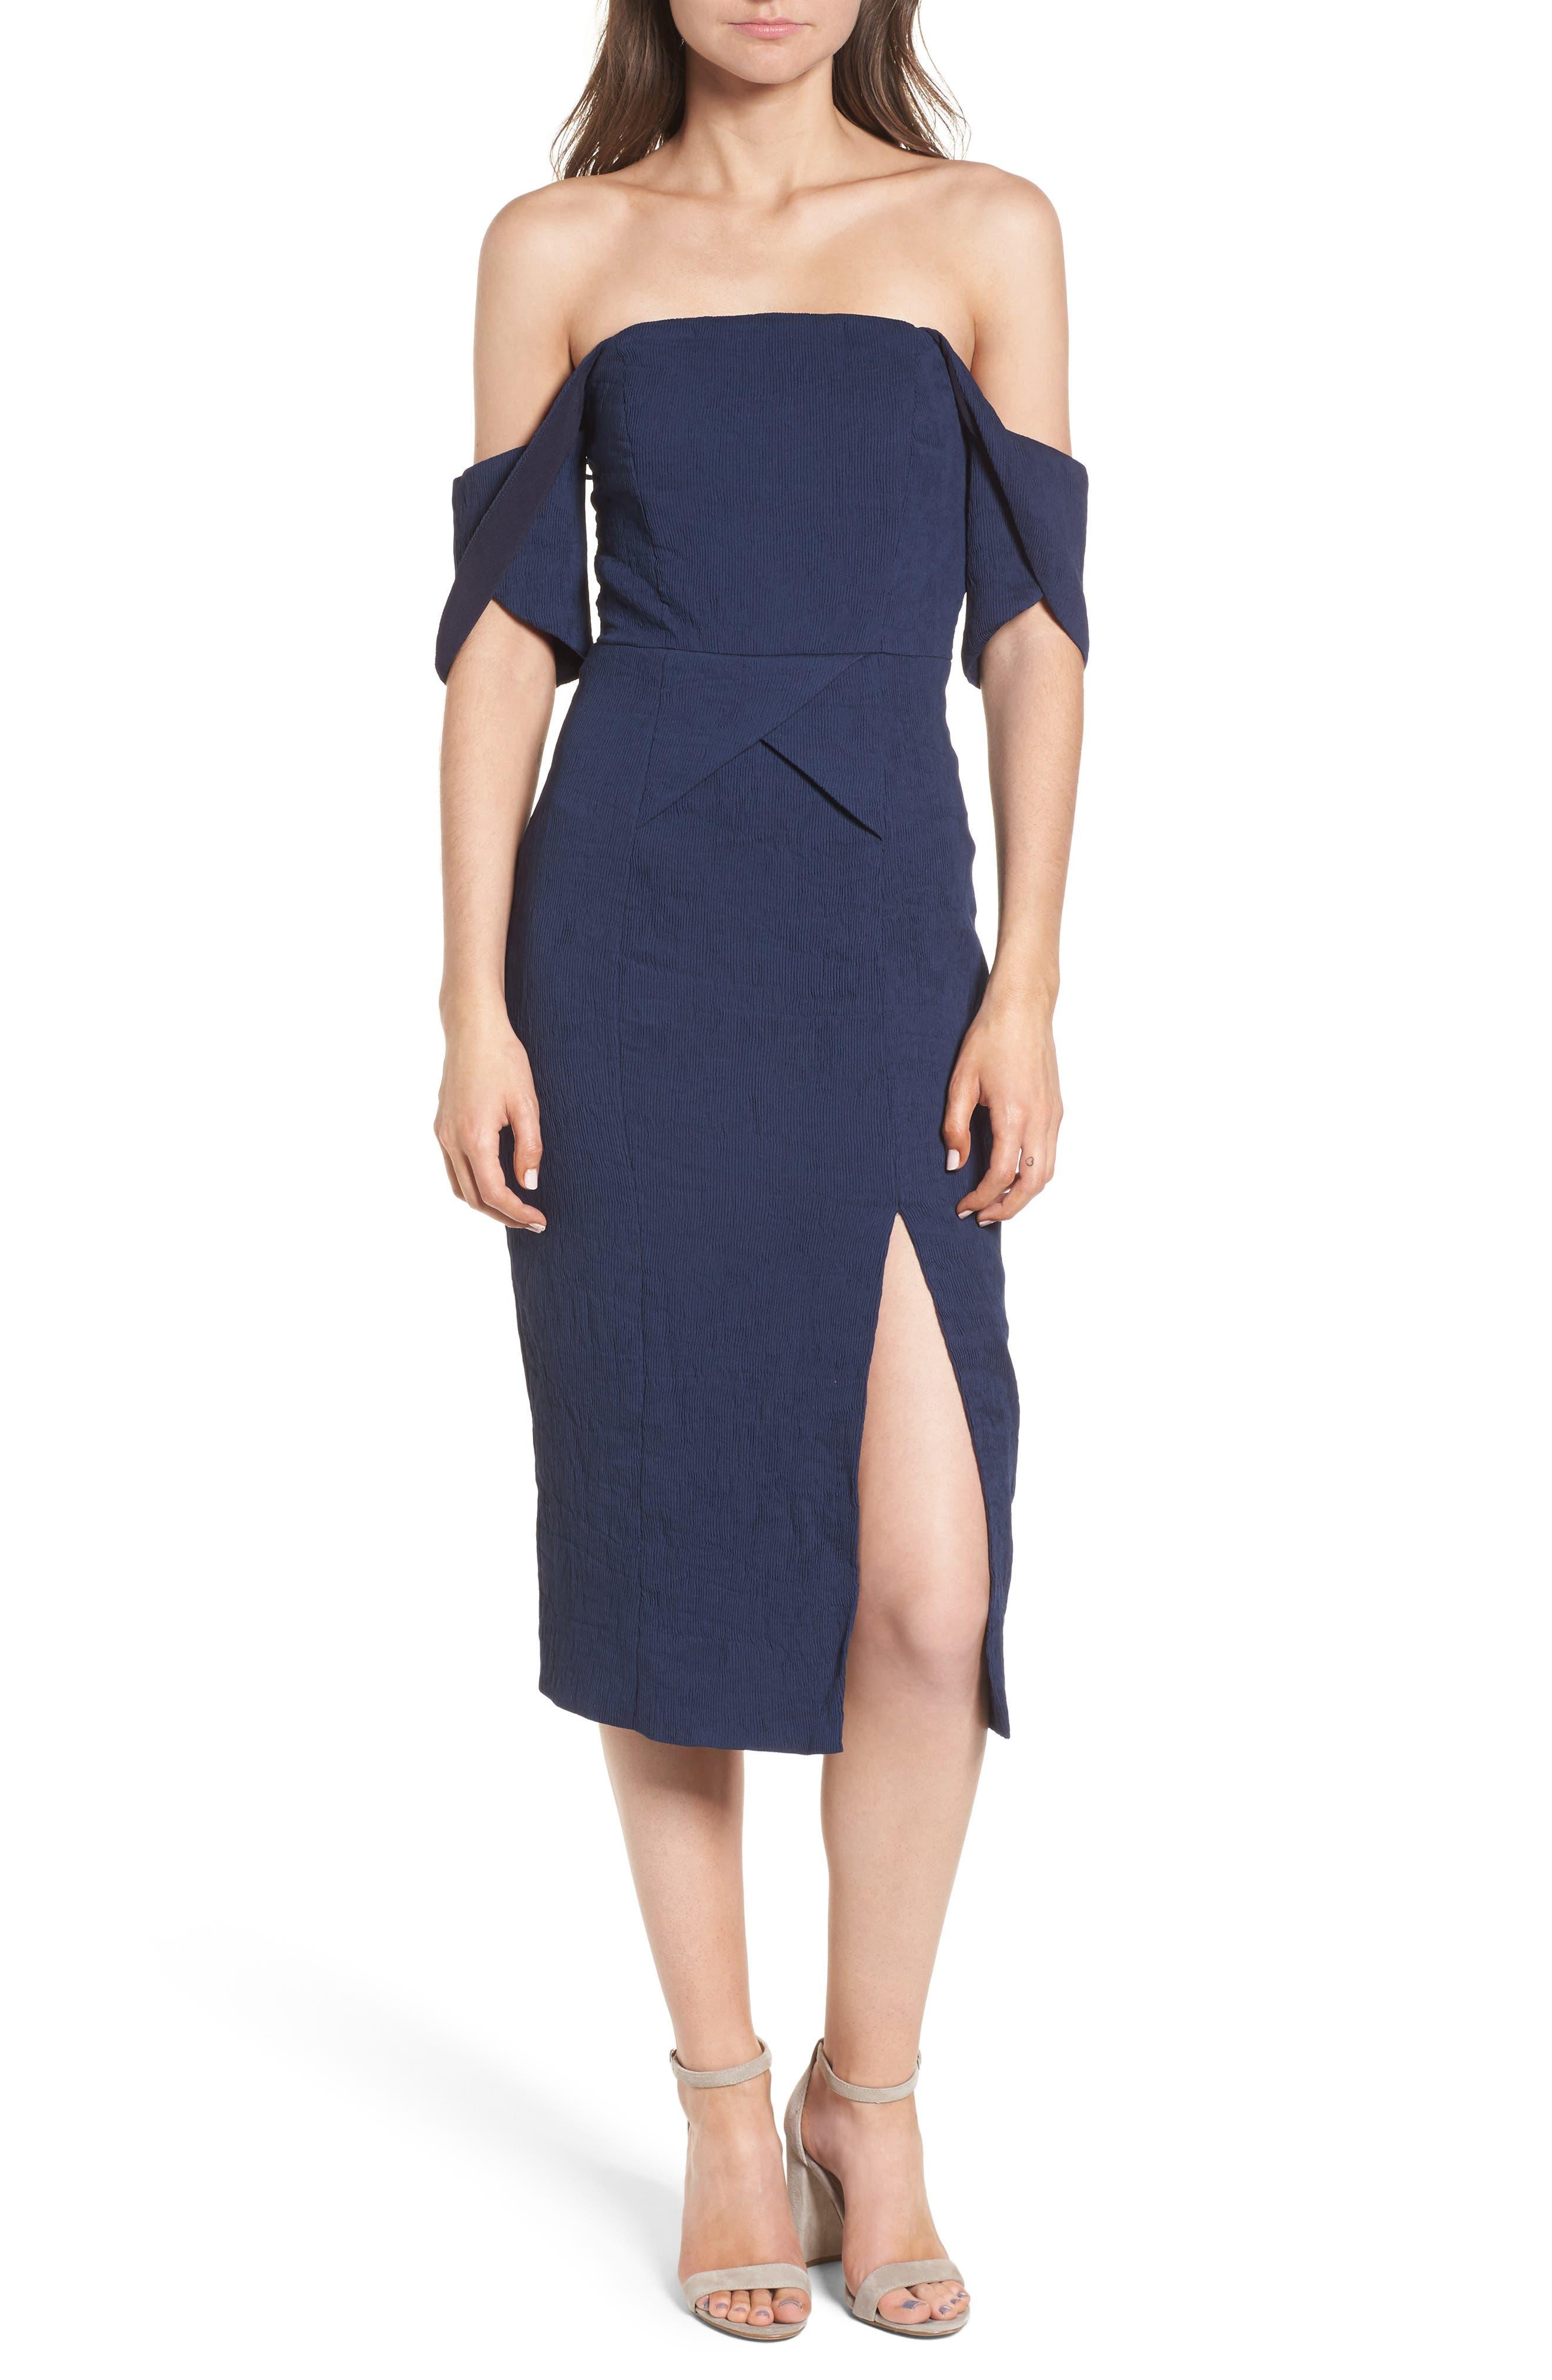 Alternate Image 1 Selected - Elliatt Acacia Off the Shoulder Dress